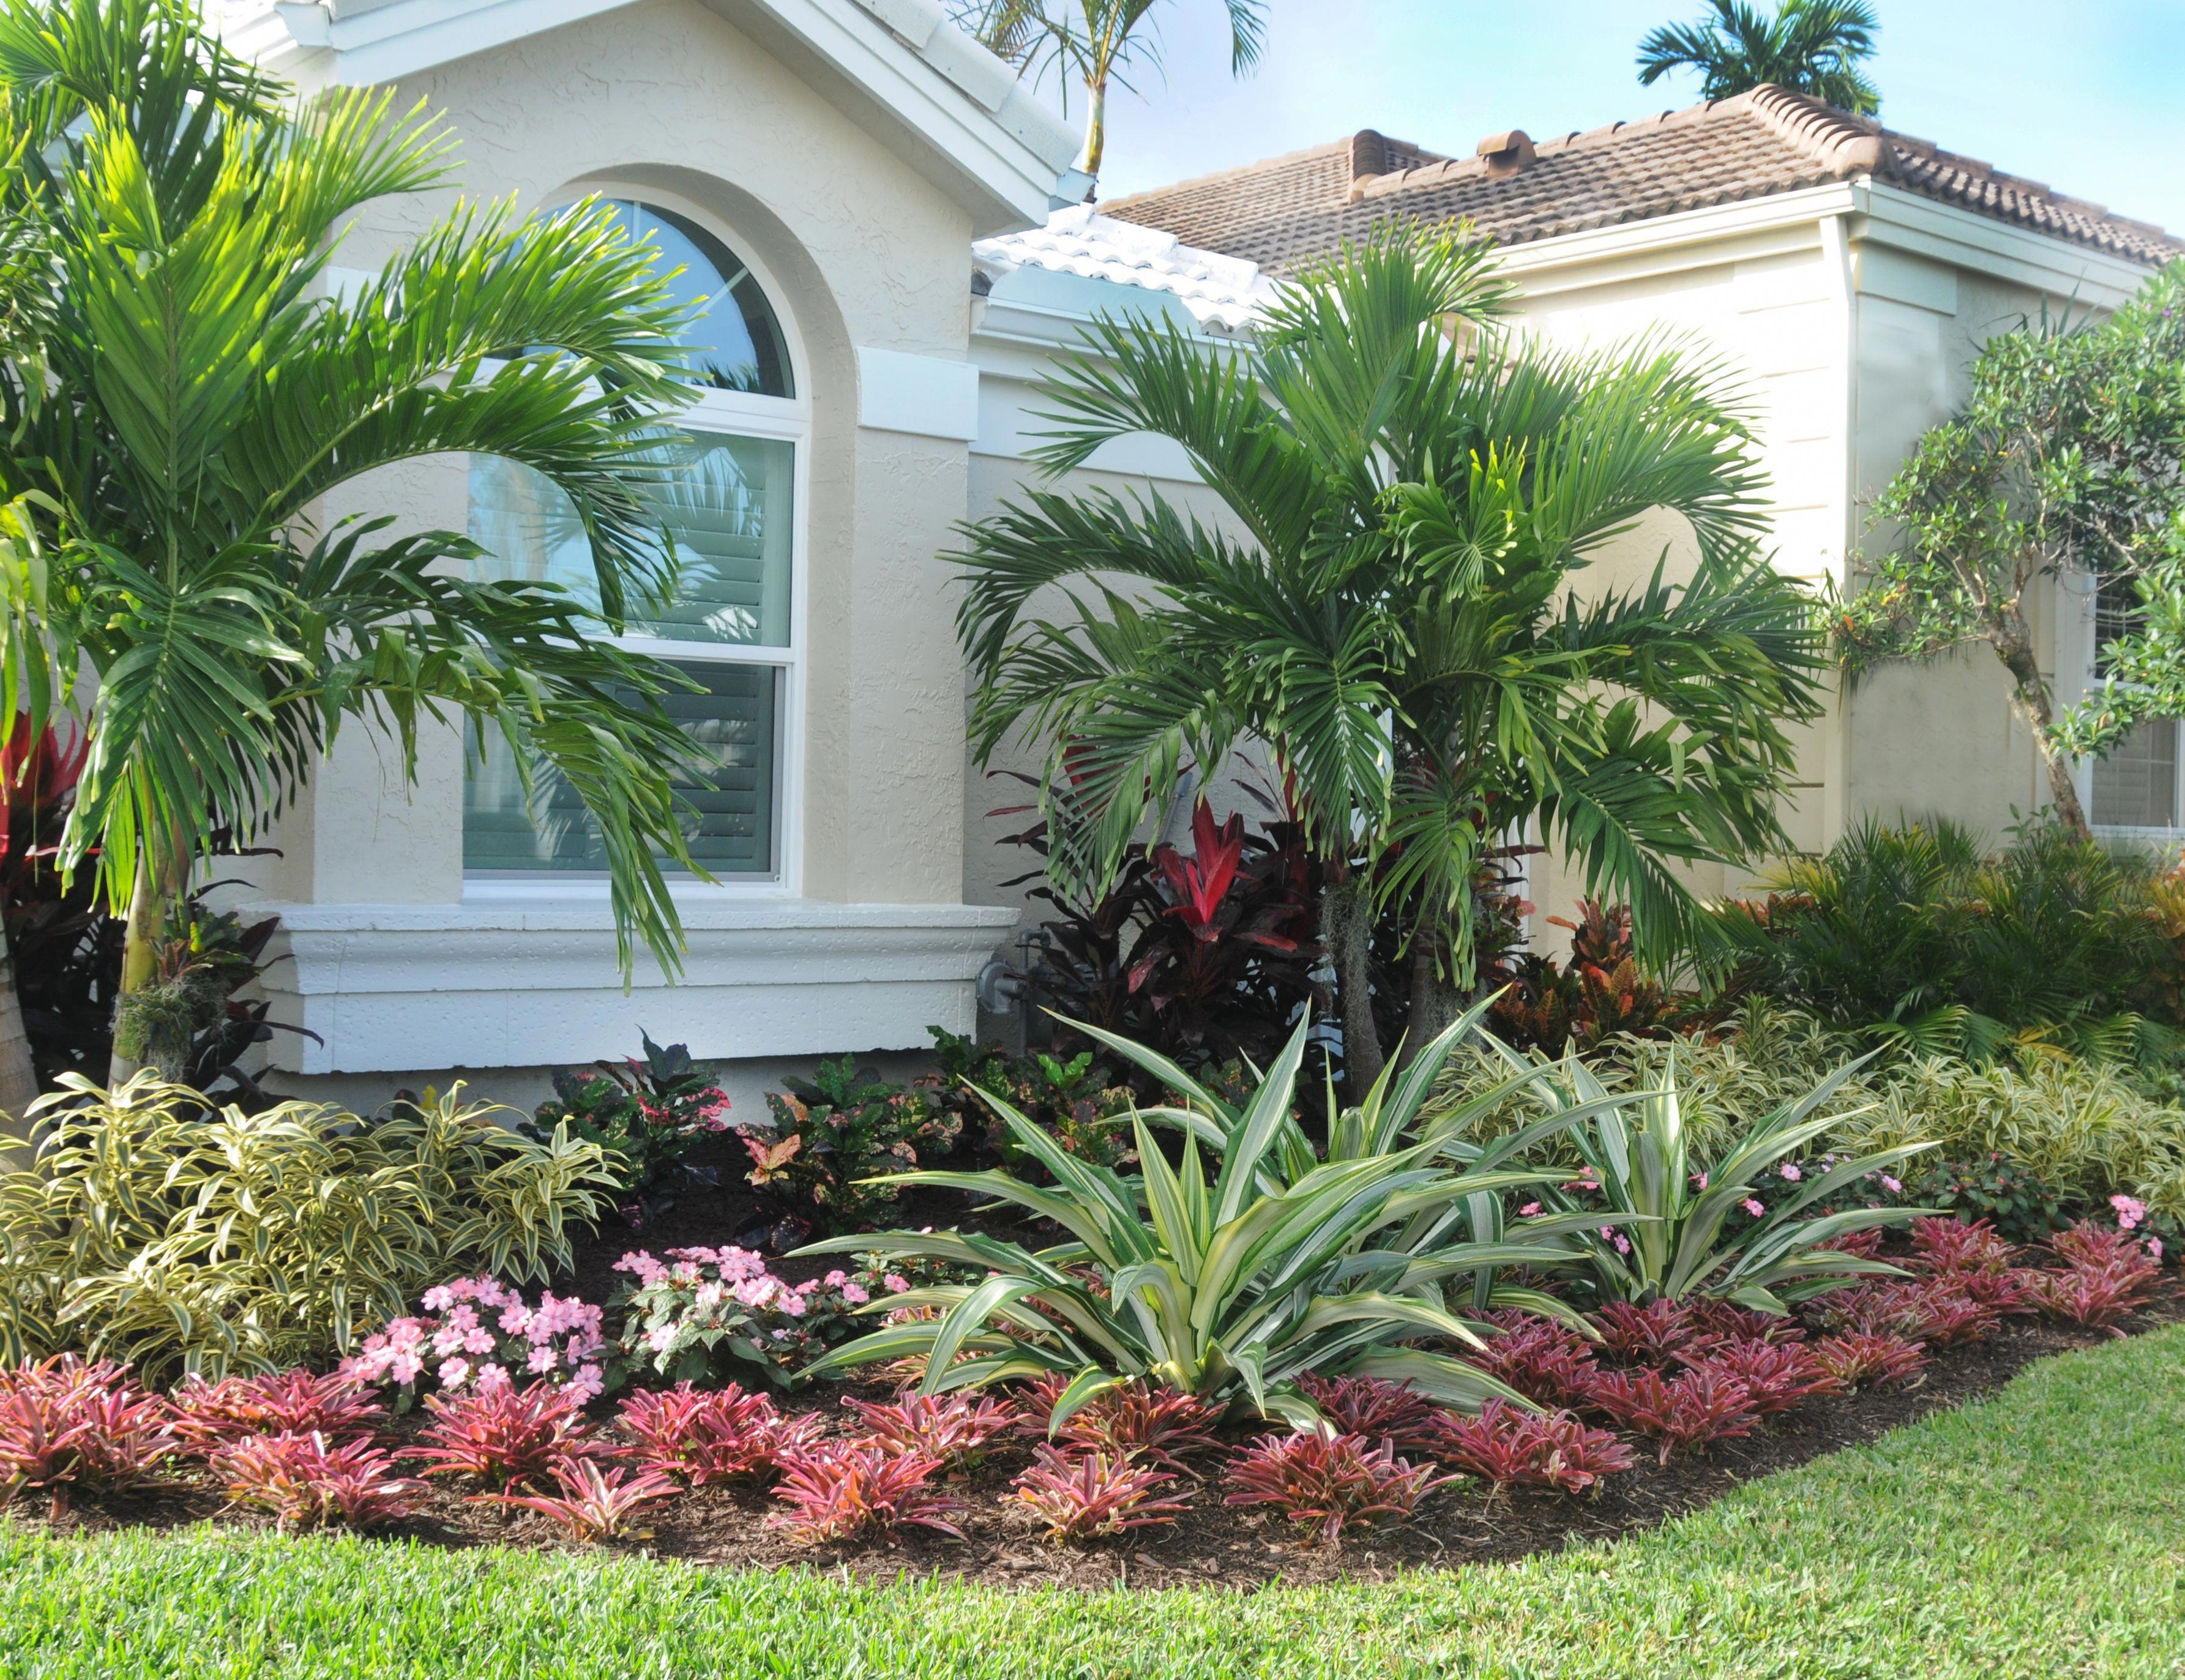 b592f214915e996ba6a4beb9e446ed93 - Dry Cleaners Palm Beach Gardens Fl